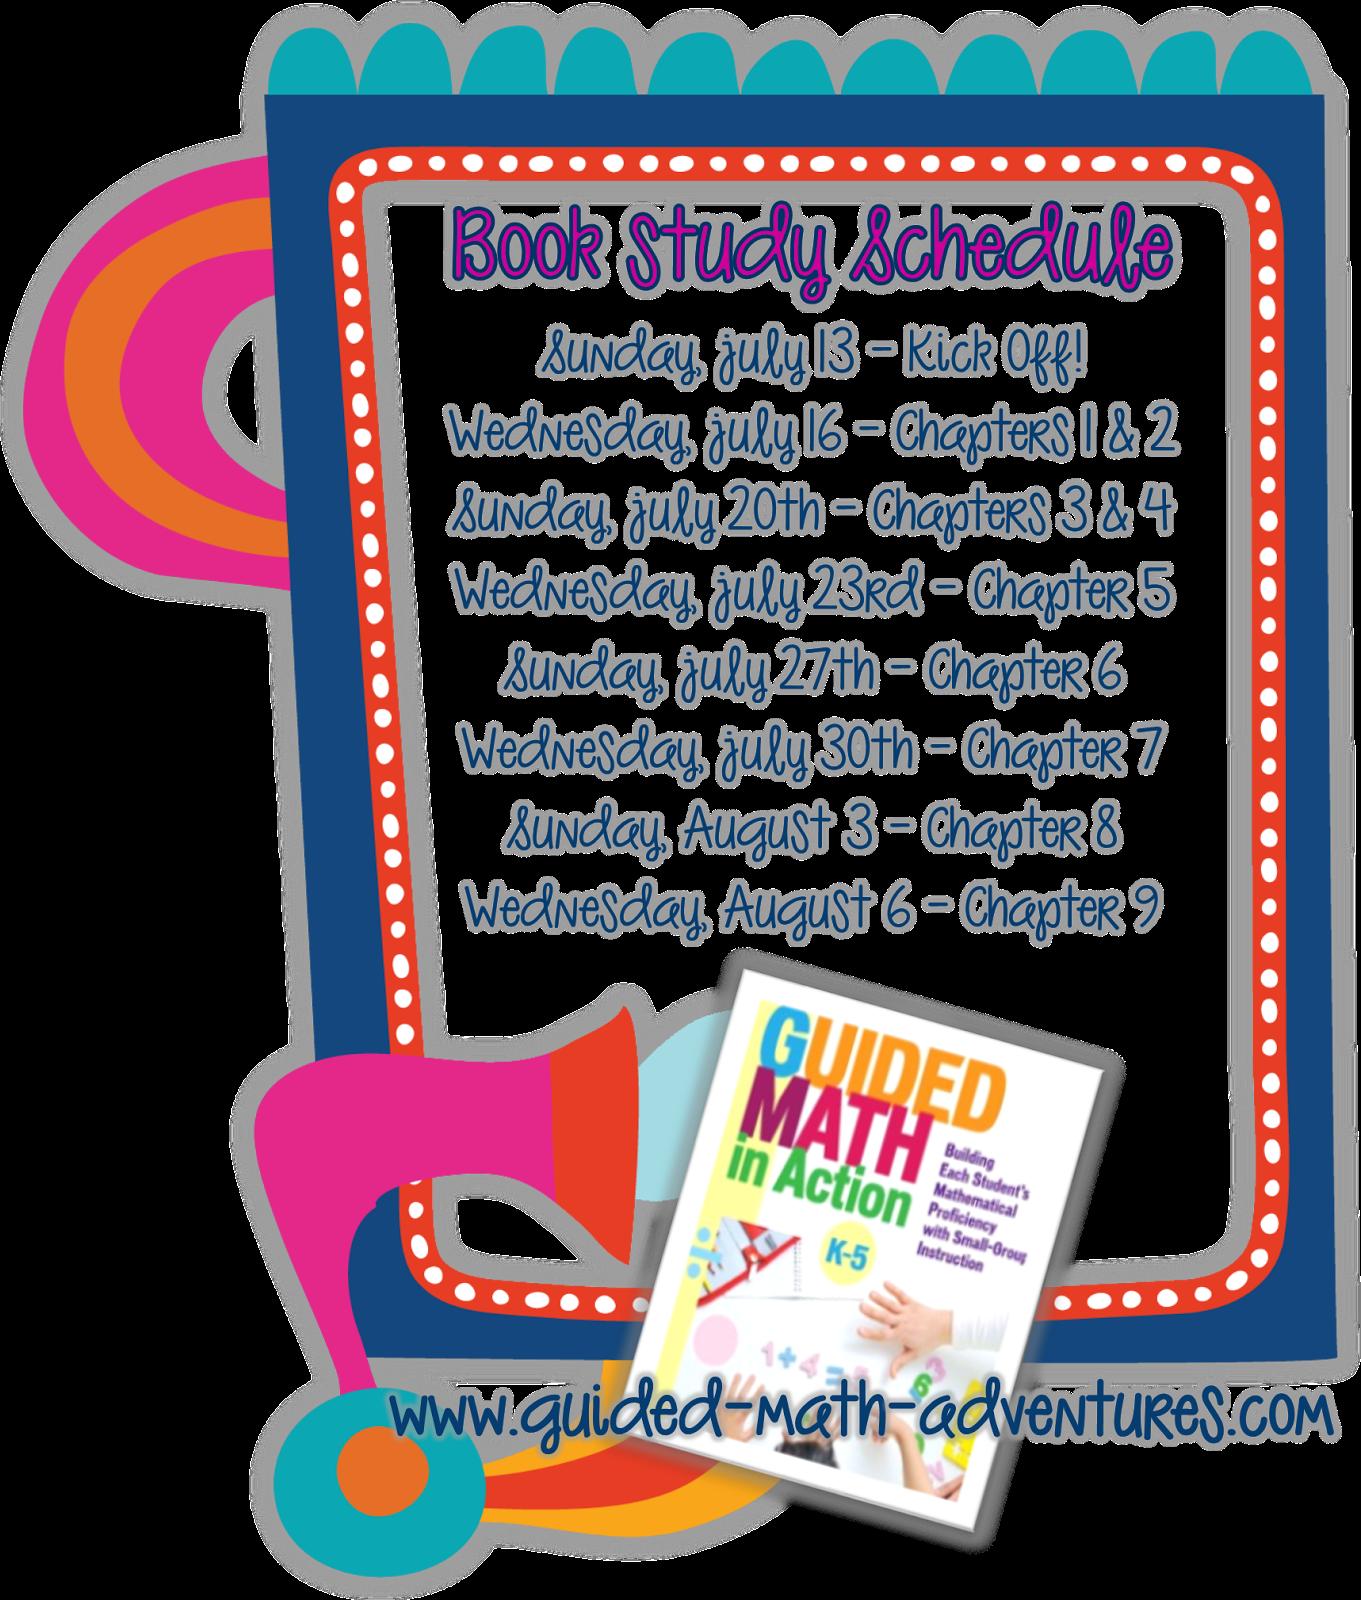 Study clipart mathematics book. On the go teacher